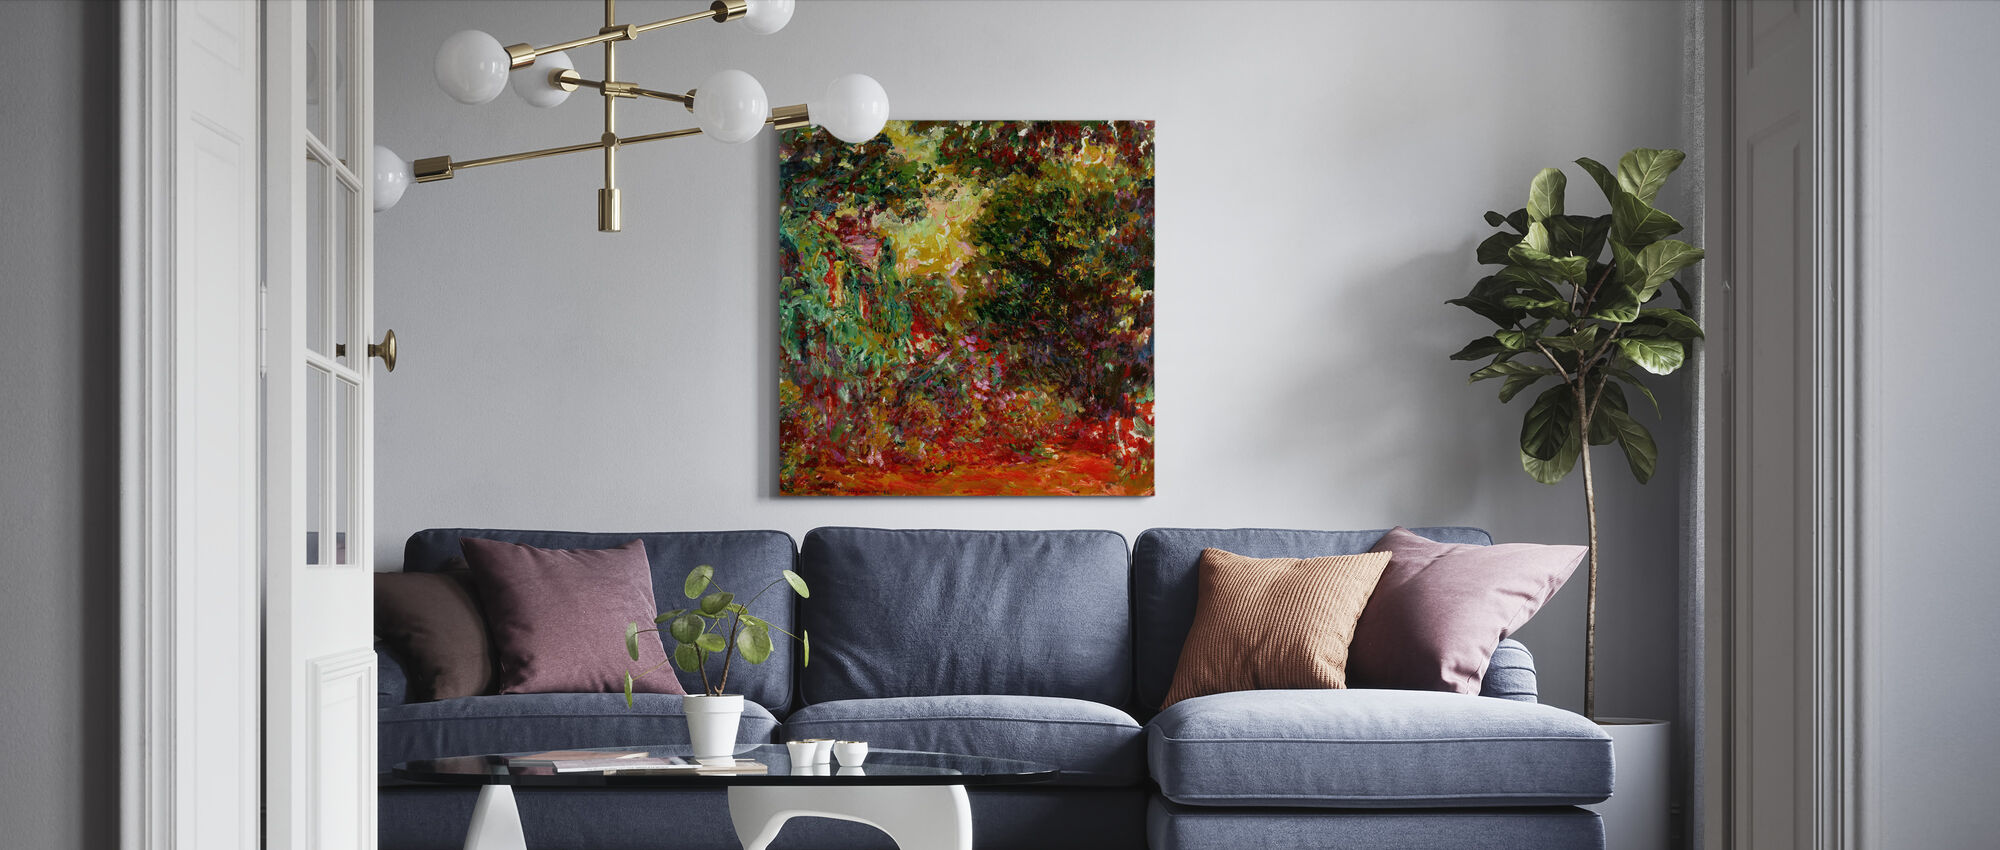 Rose Garden - Claude Monet - Canvas print - Living Room